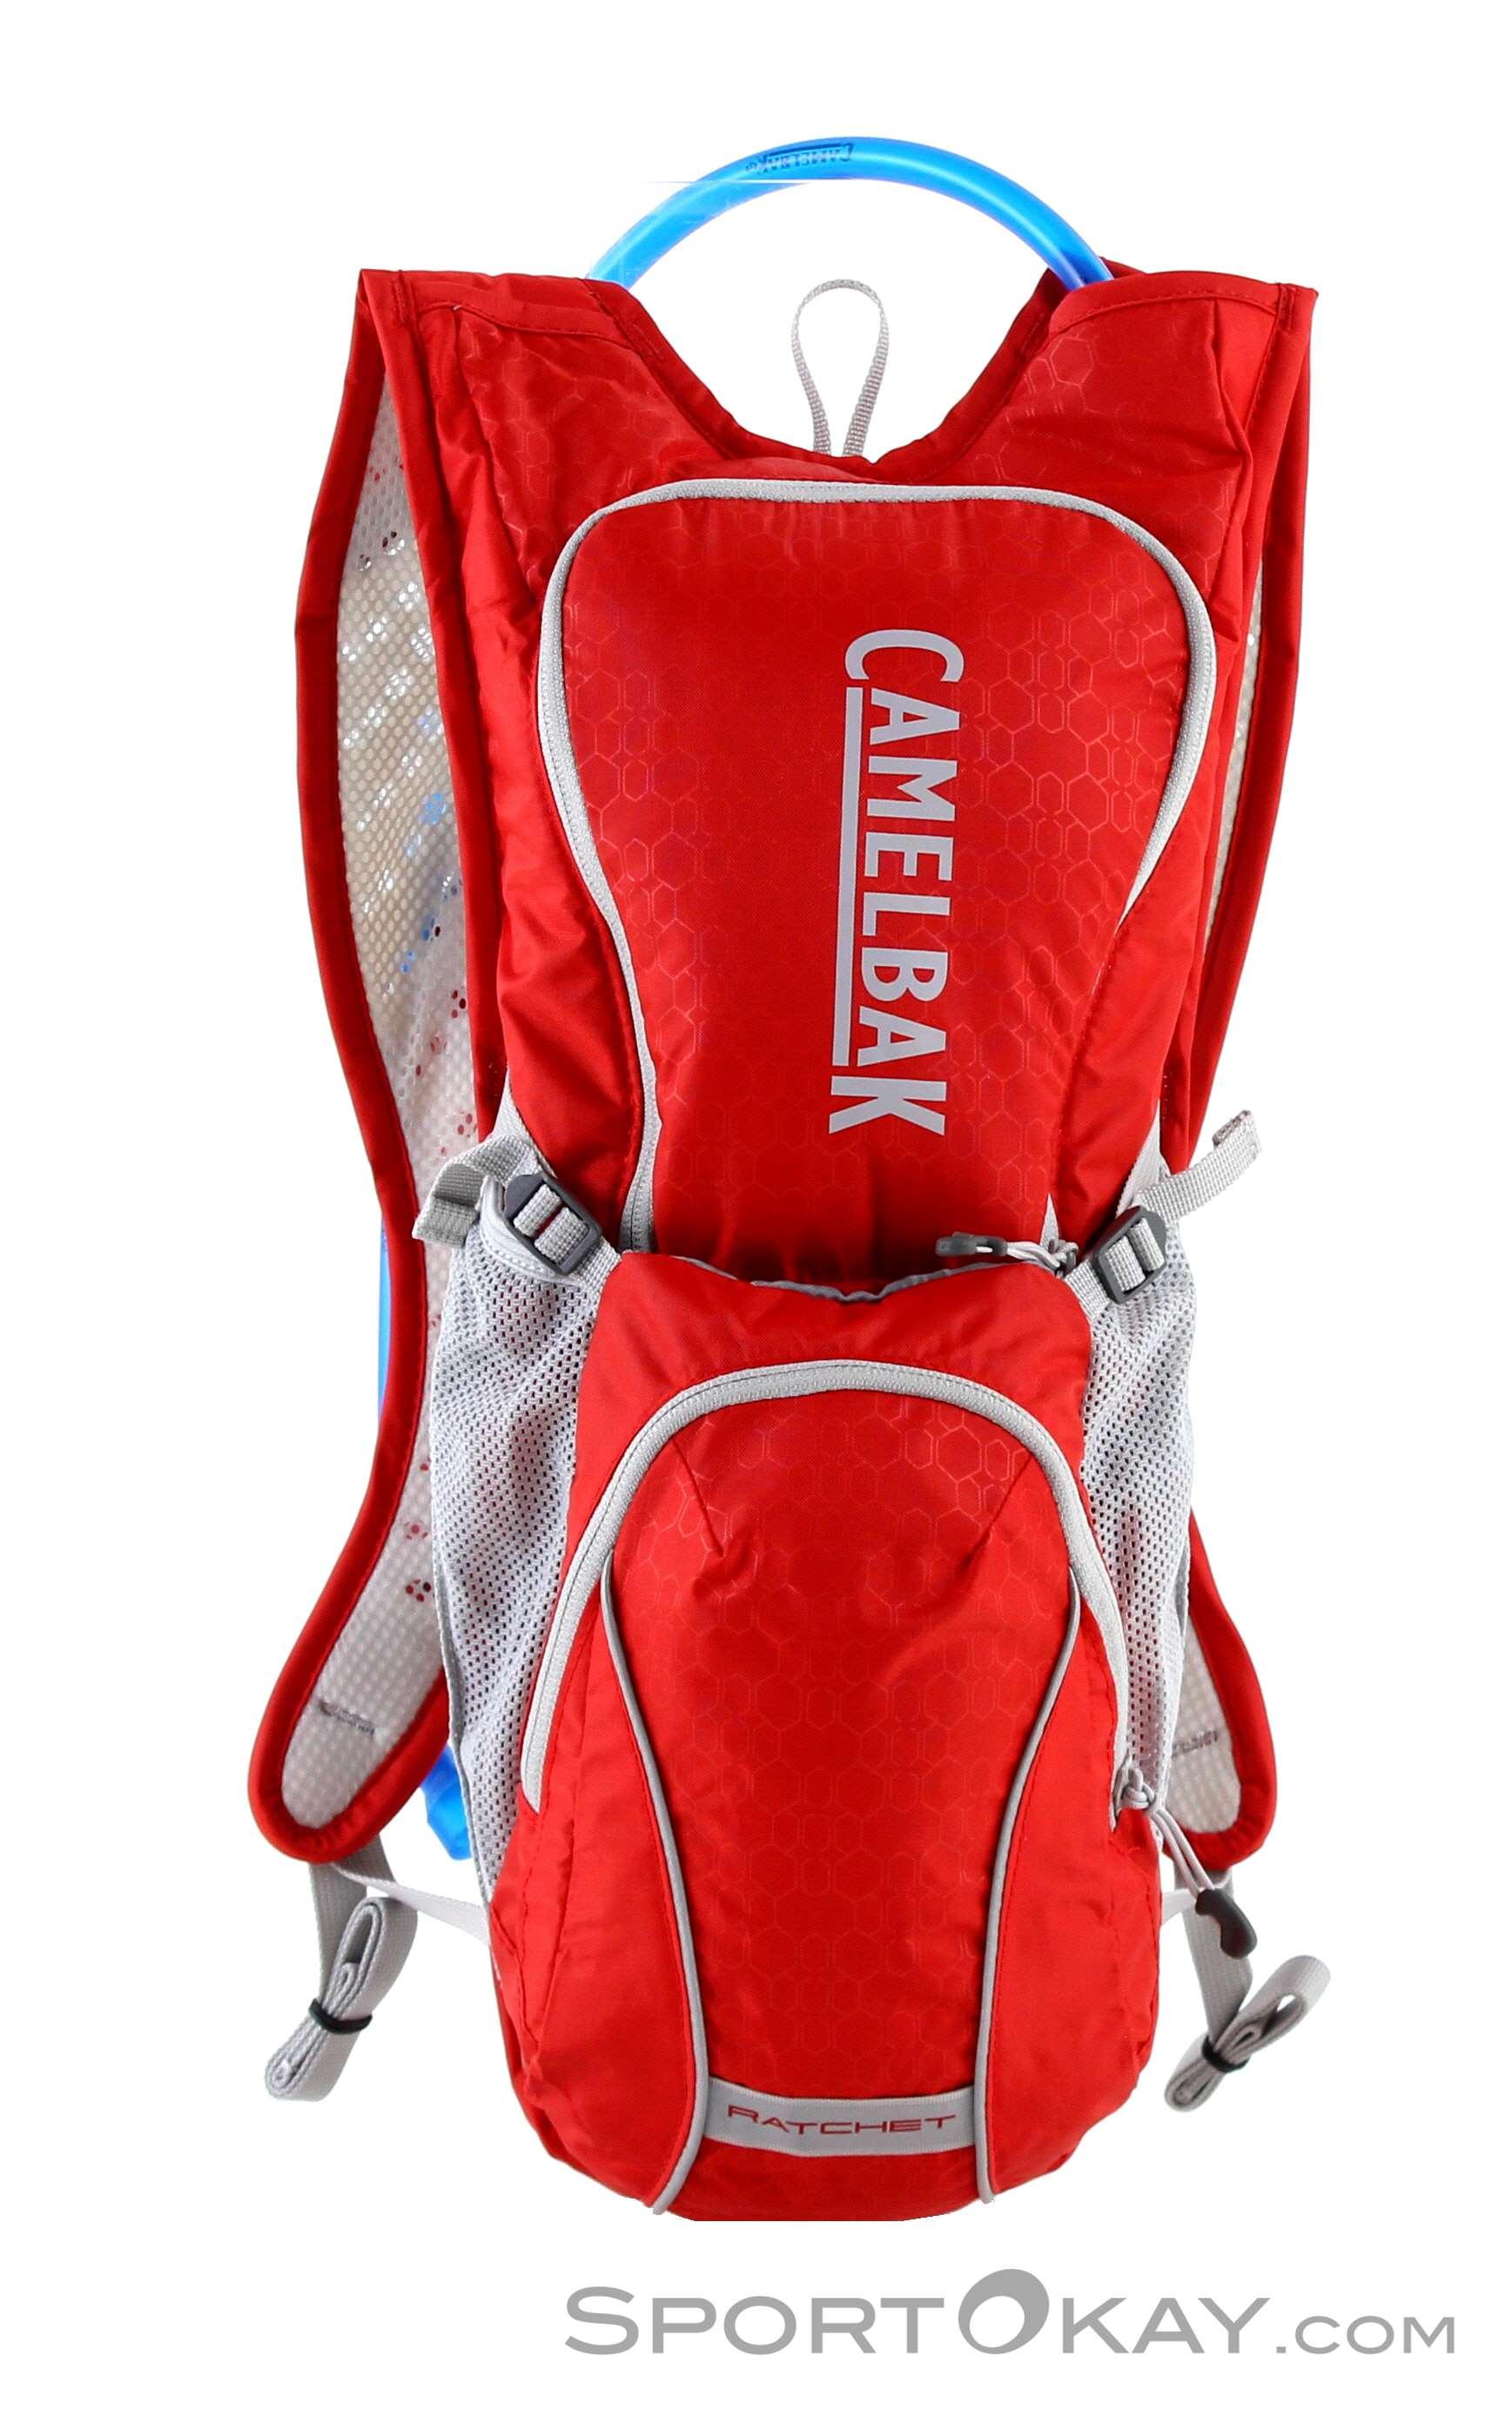 Camelbak Ratchet 3+3l Bikerucksack mit Trinksystem-Rot-6